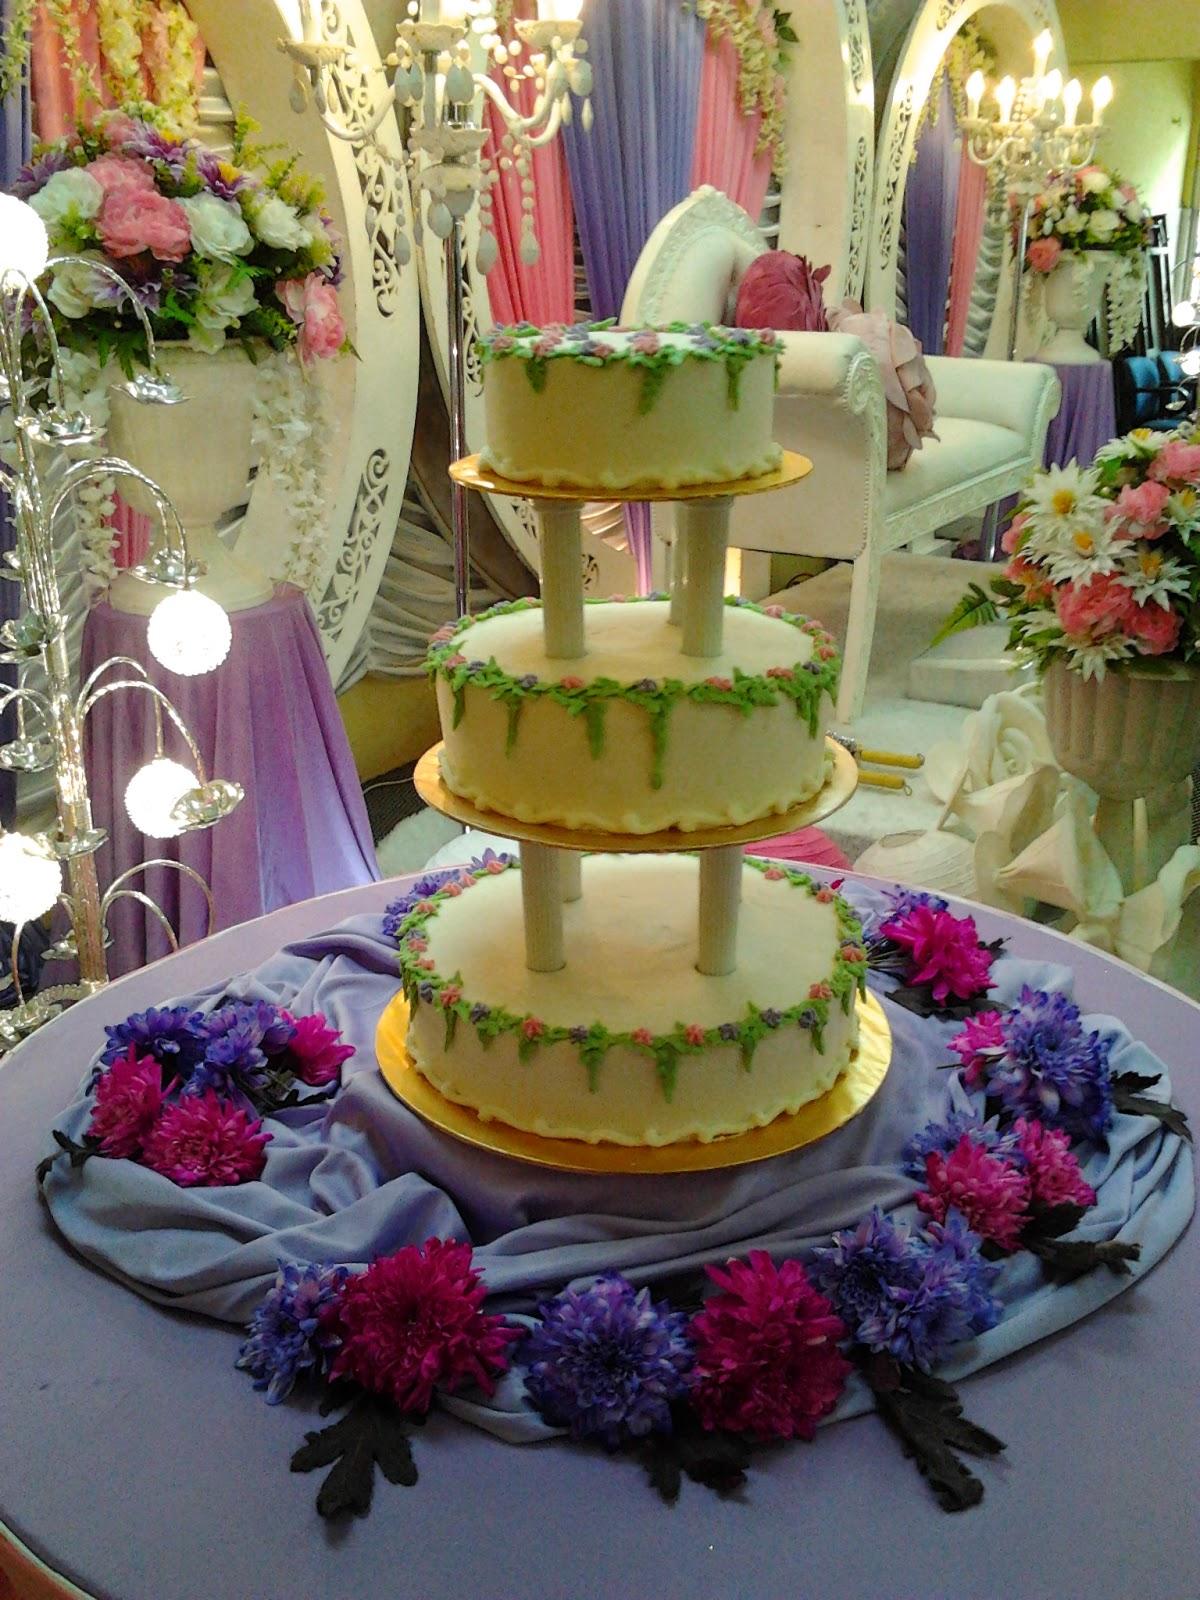 Wedding Cakes, Birthday Cakes In Subang Jaya And Shah Alam.